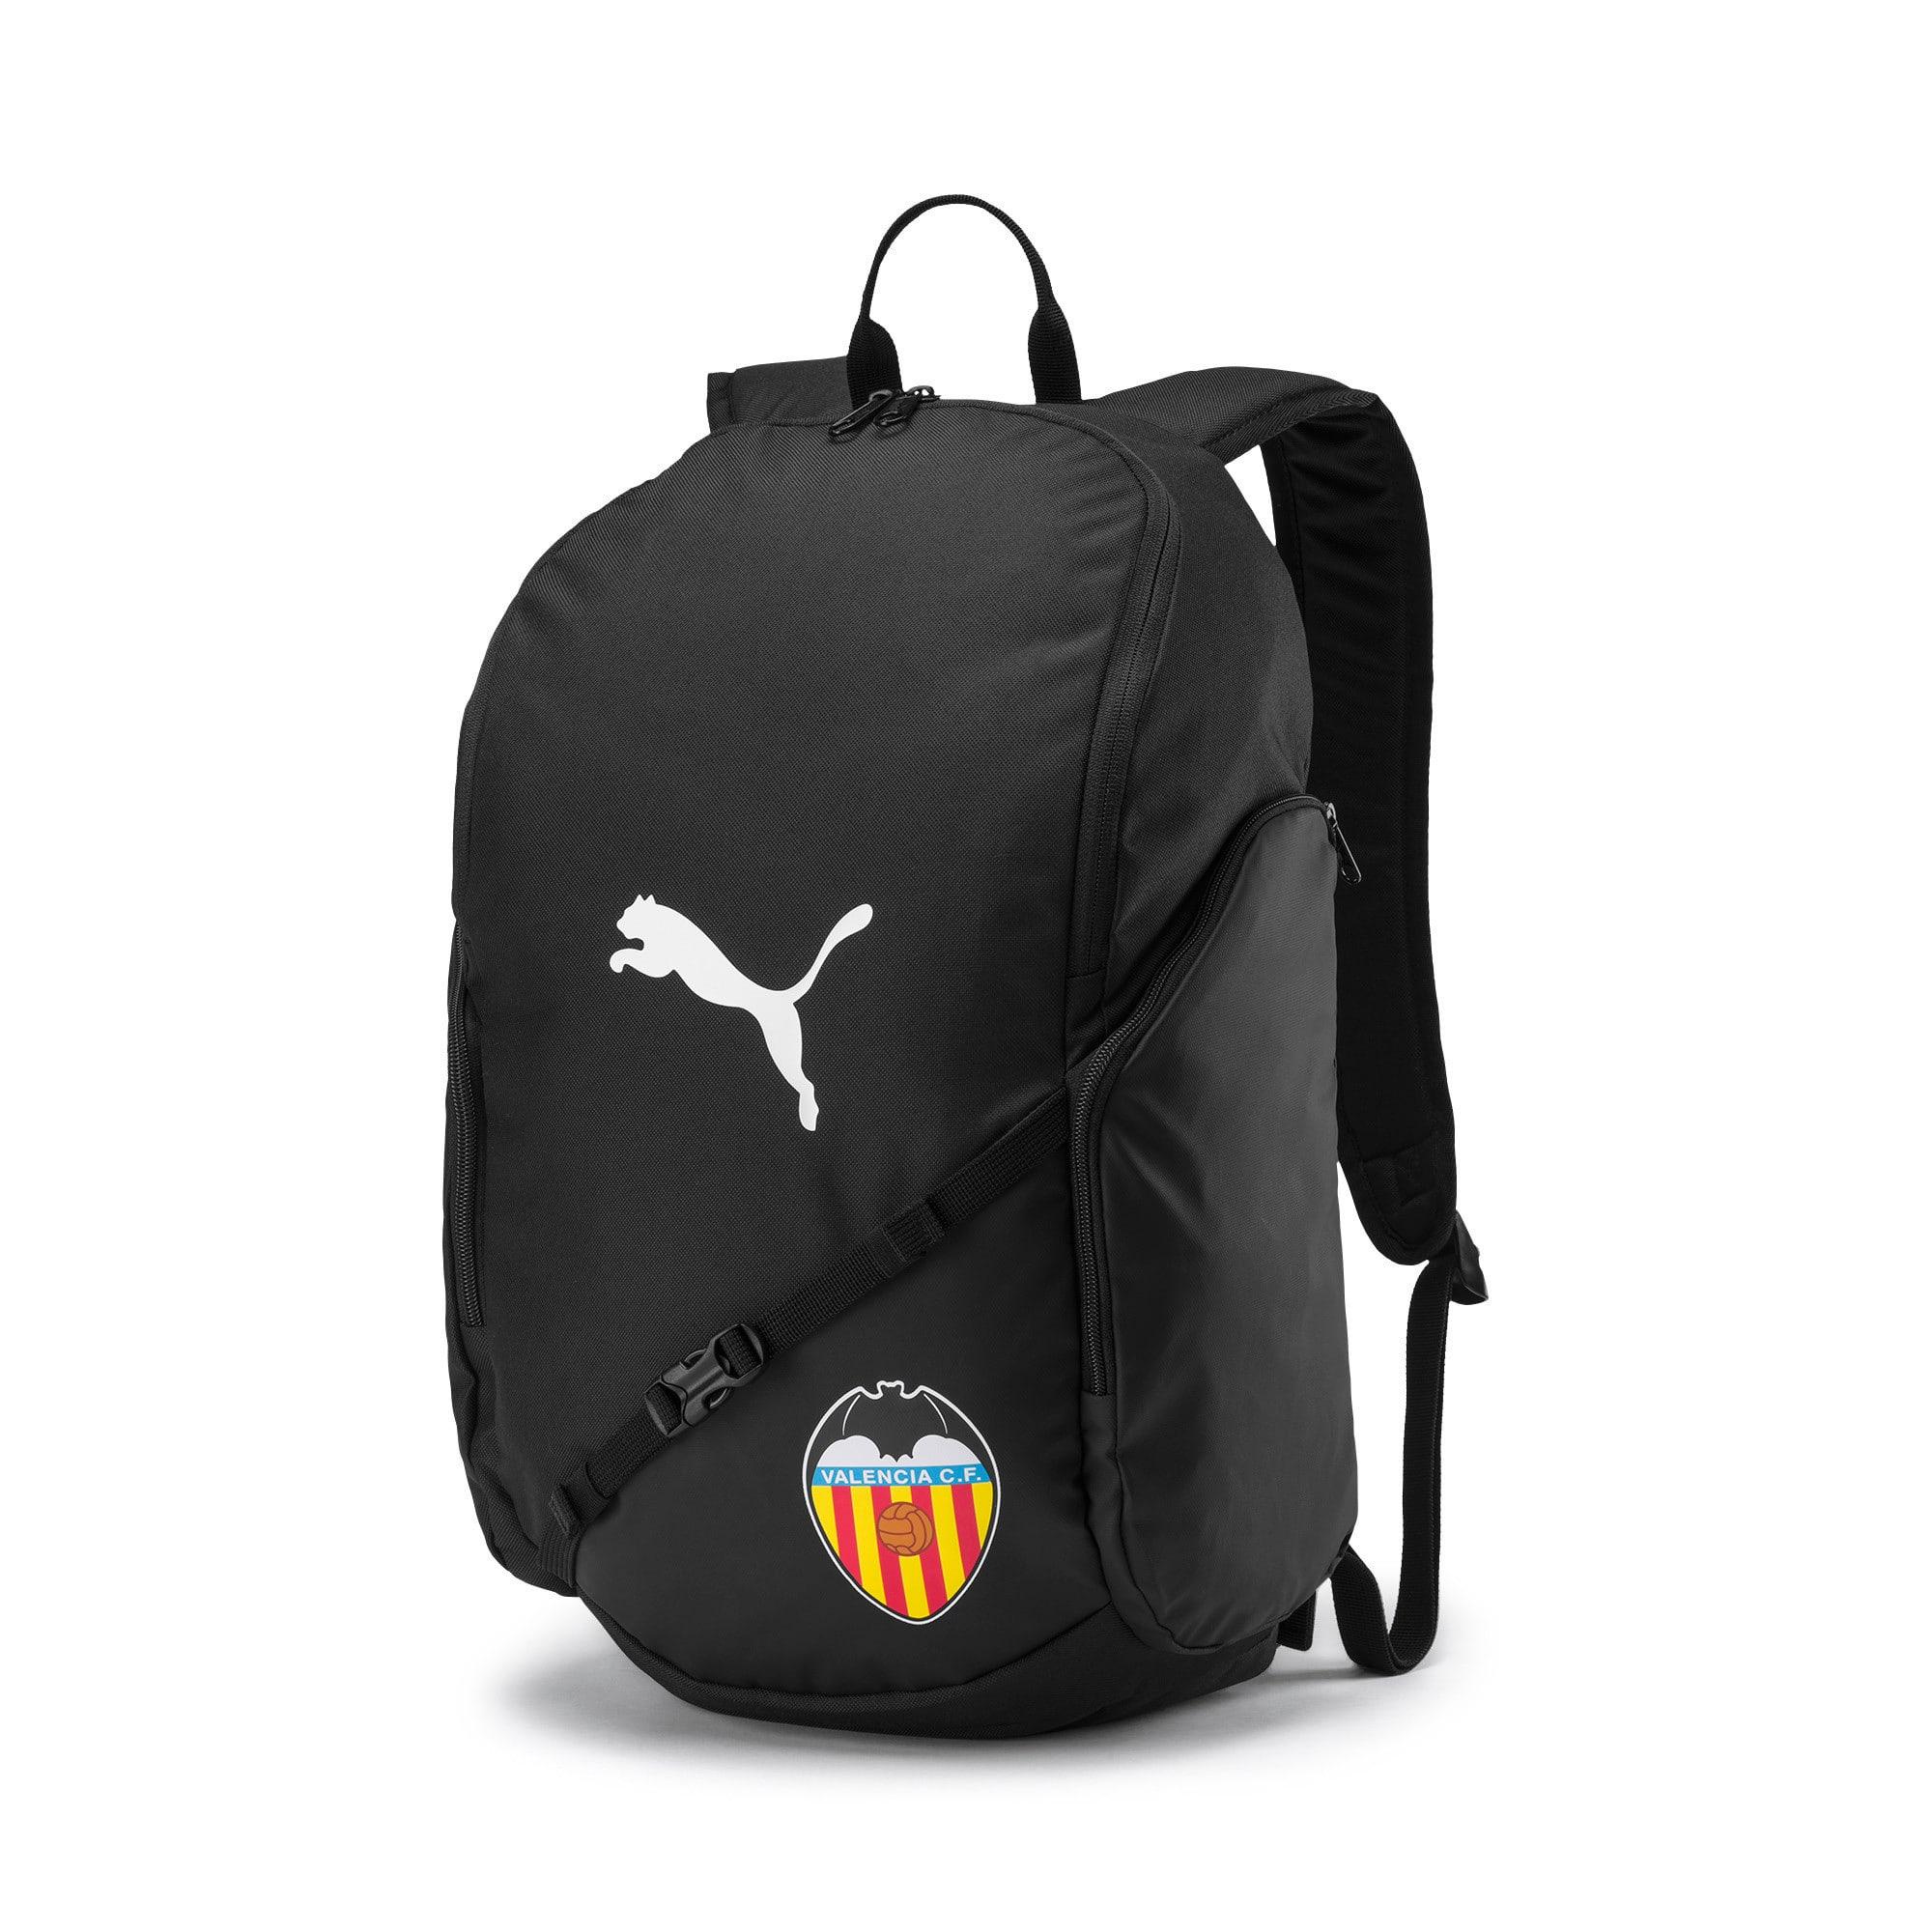 Thumbnail 1 of Valencia CF LIGA Football Backpack, Puma Black-Puma White, medium